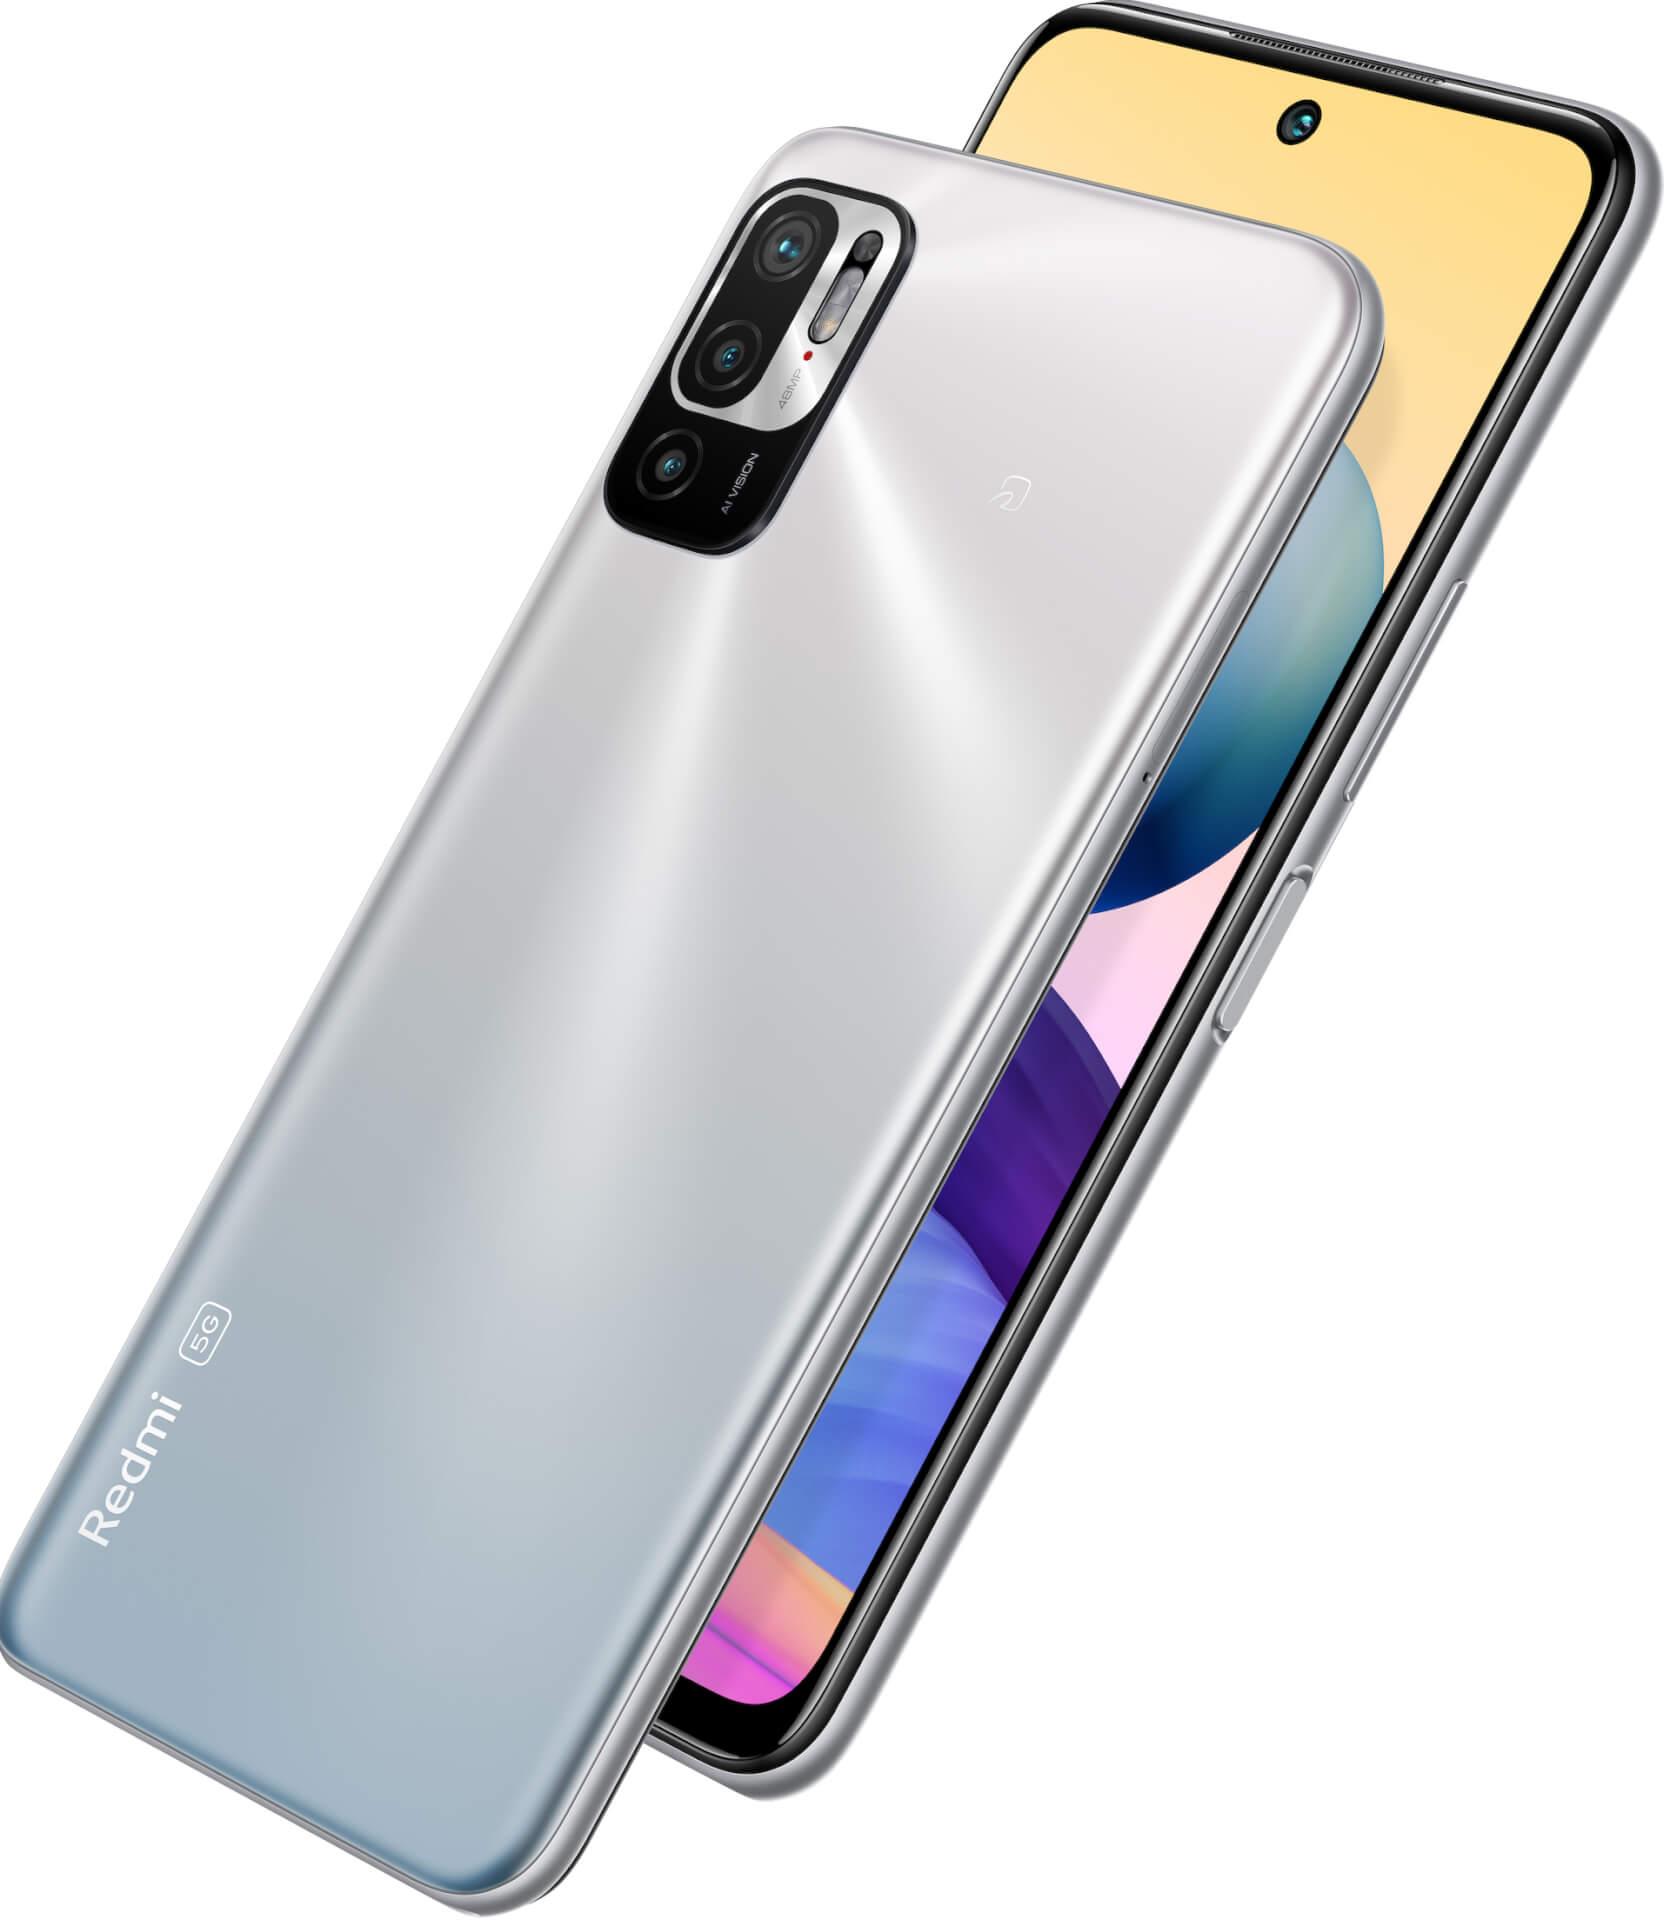 Xiaomiから初の日本独自モデルの5Gスマホ『Redmi Note 10 JE』が発売決定!AI顔認証、側面指紋認識センサーも搭載 tech210802_xiaomi_5g_8